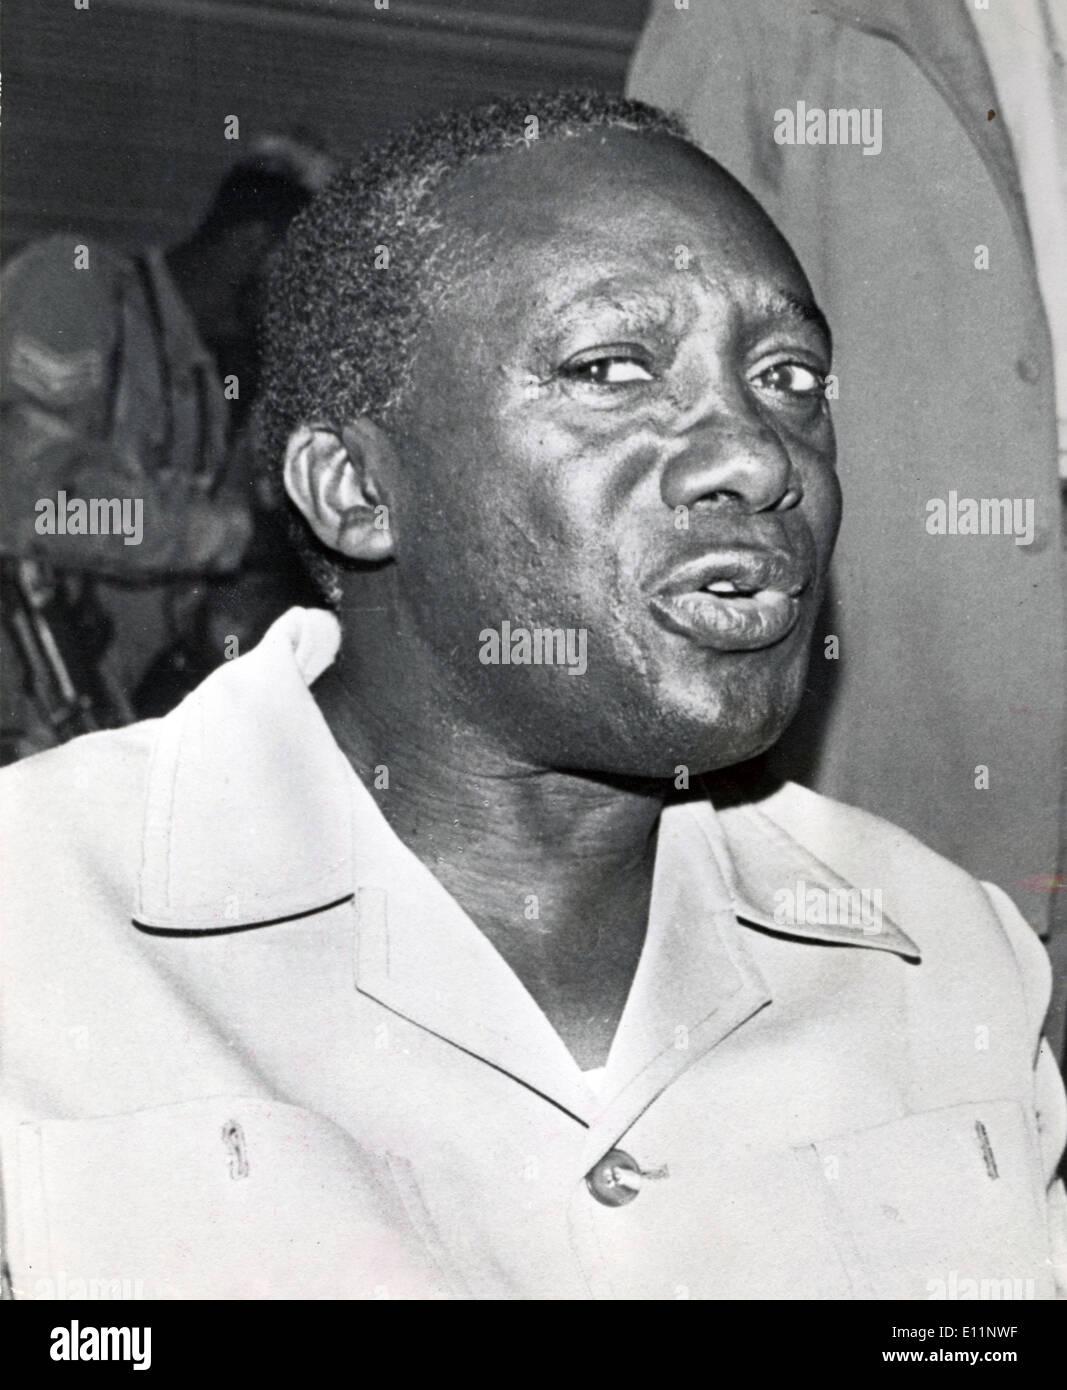 Apr. 20, 1979 - Kampala, Uganda - President of Uganda YUSUF LULE pledges to restore democracy to Uganda via Kampala radio broadcast. - Stock Image